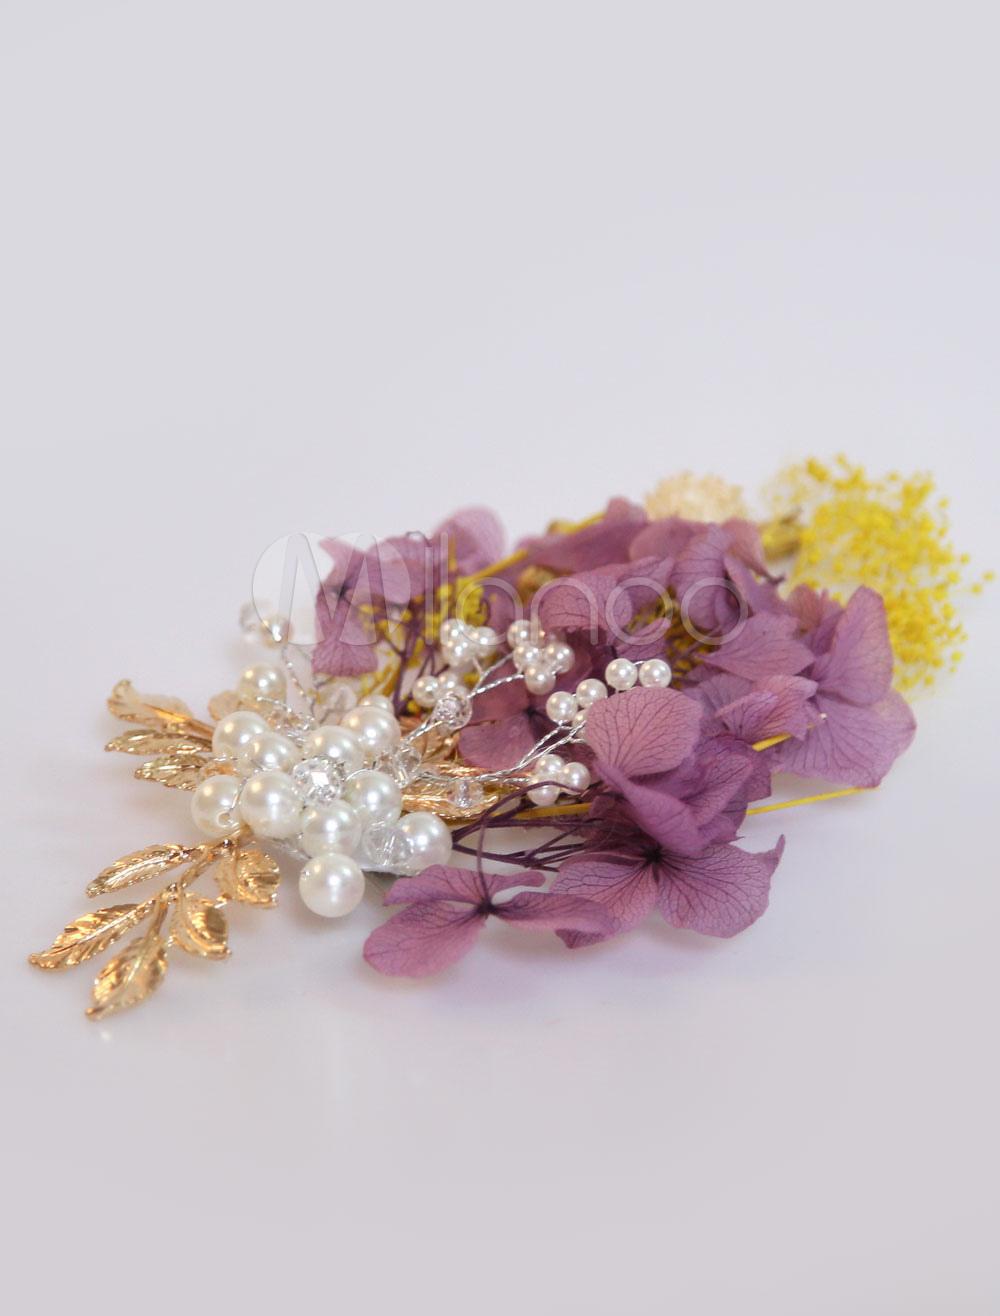 Buy Flower Wedding Headpieces Plum Pearls Leaf Bridal Hair Accessories for $9.99 in Milanoo store